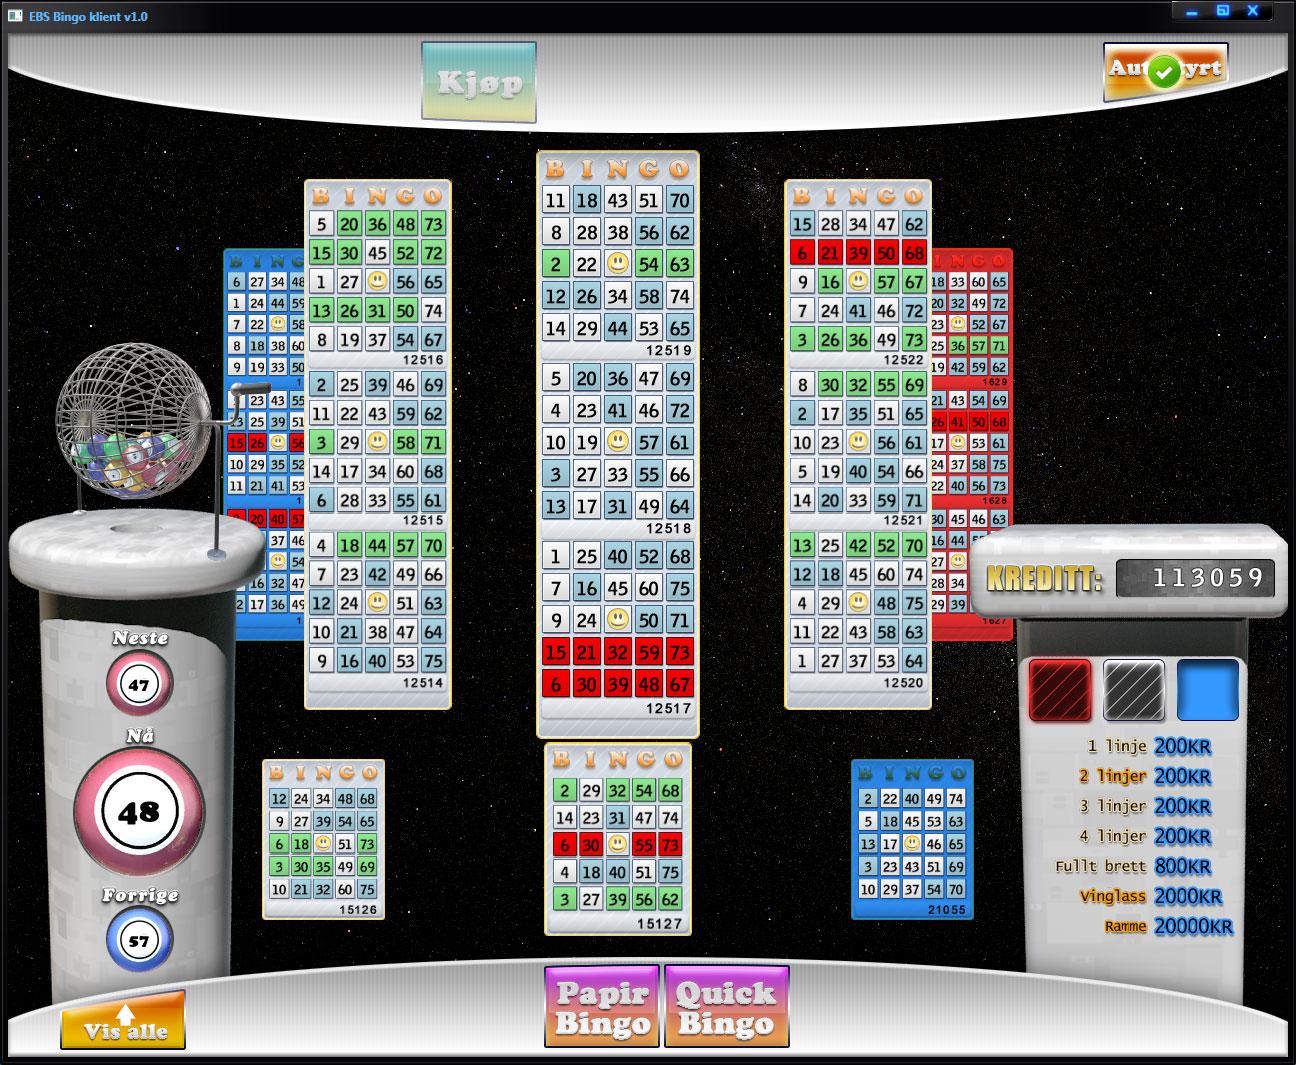 hovedspill_bingo_2R